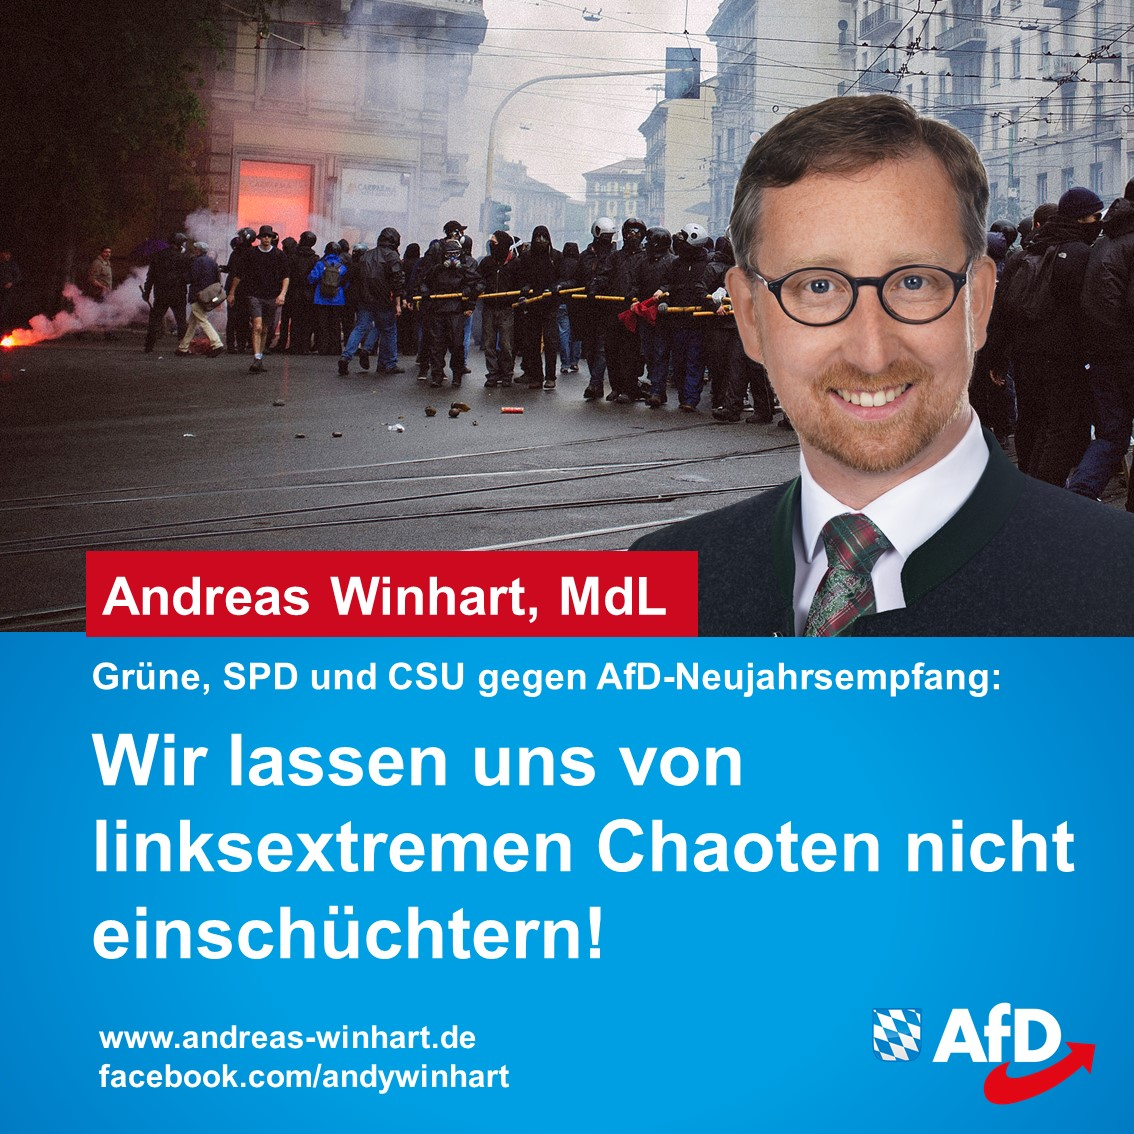 AfD-Neujahrsempfang nach linksextremer Bedrohungslage verlegt